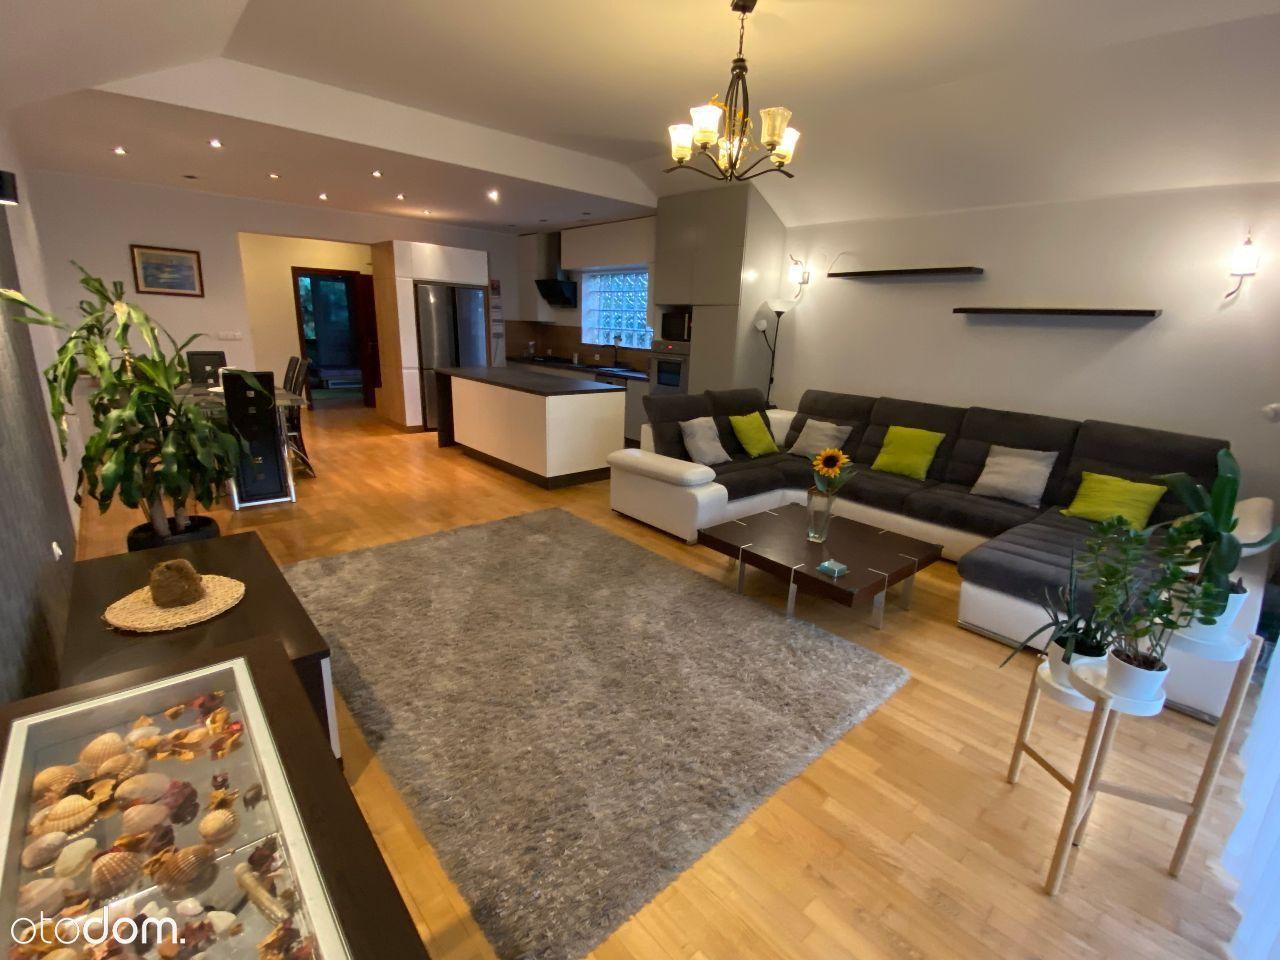 Mieszkanie/dom 4 pokoje LAS METRO Cent.Han Atrium